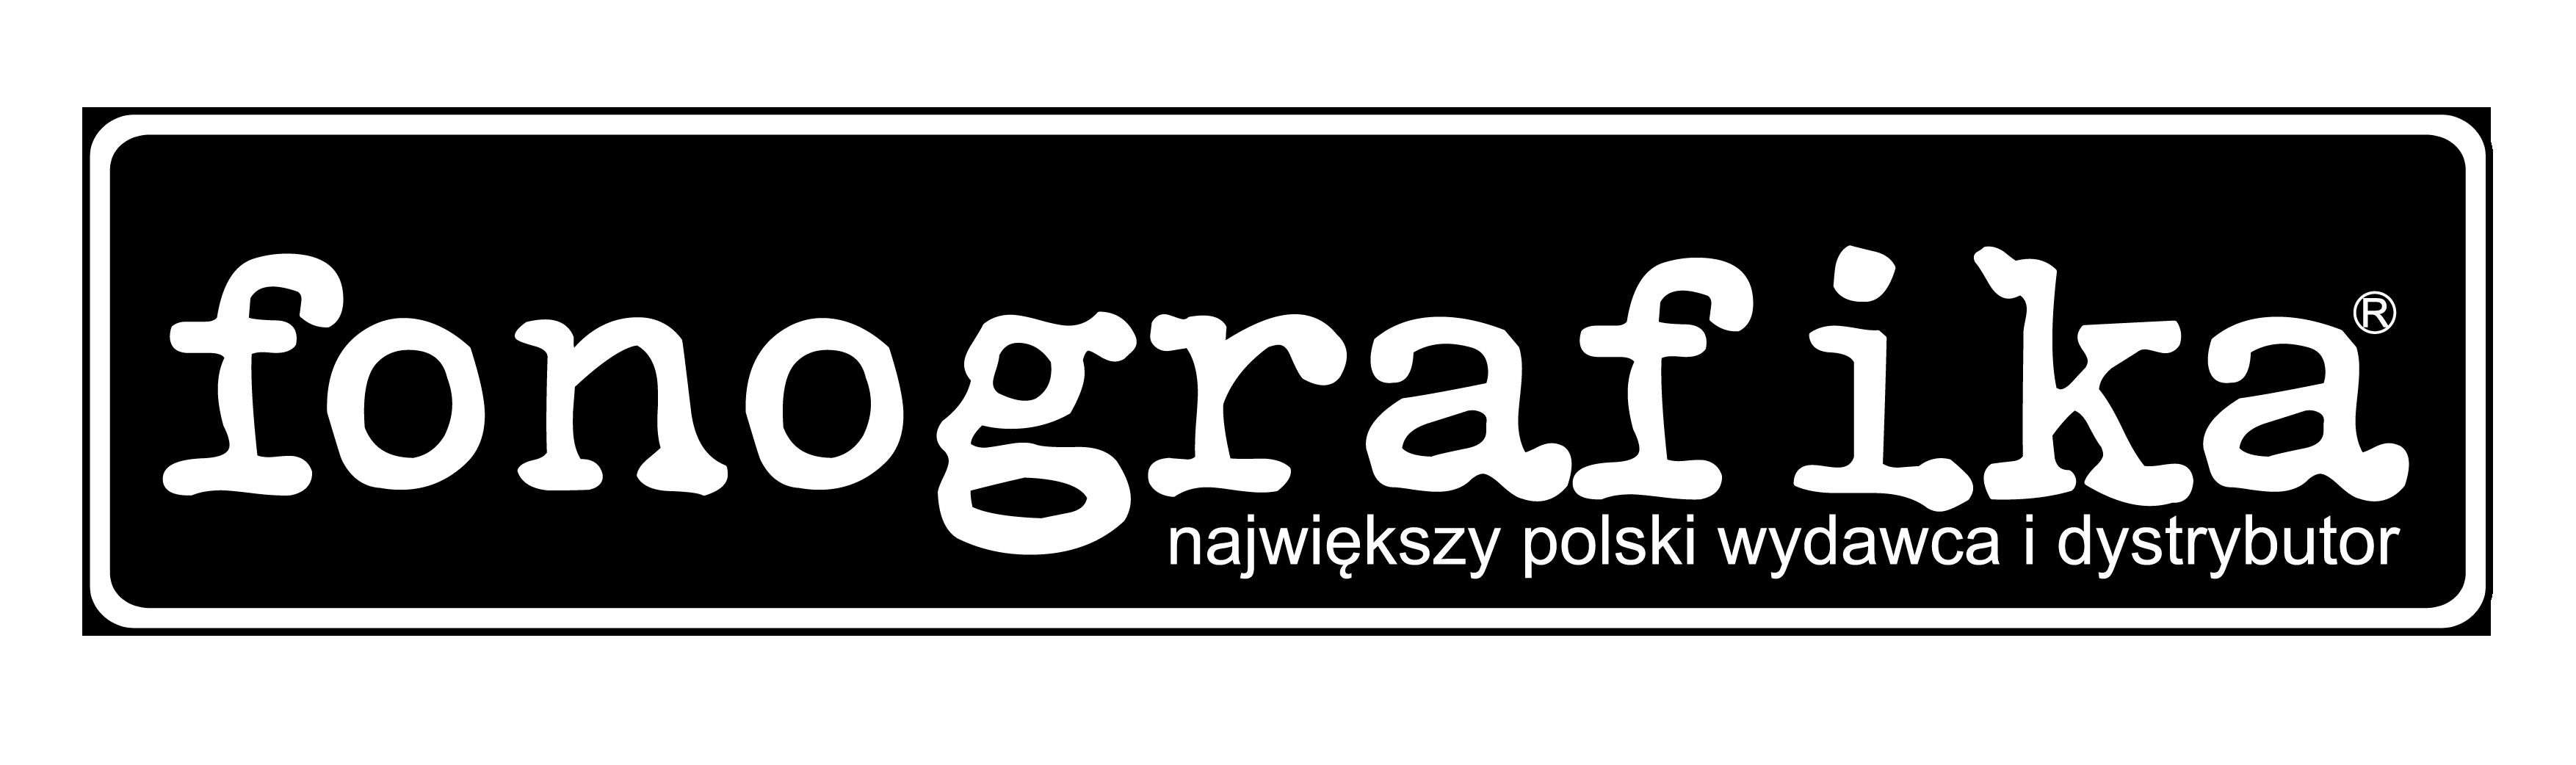 fonografika_logo